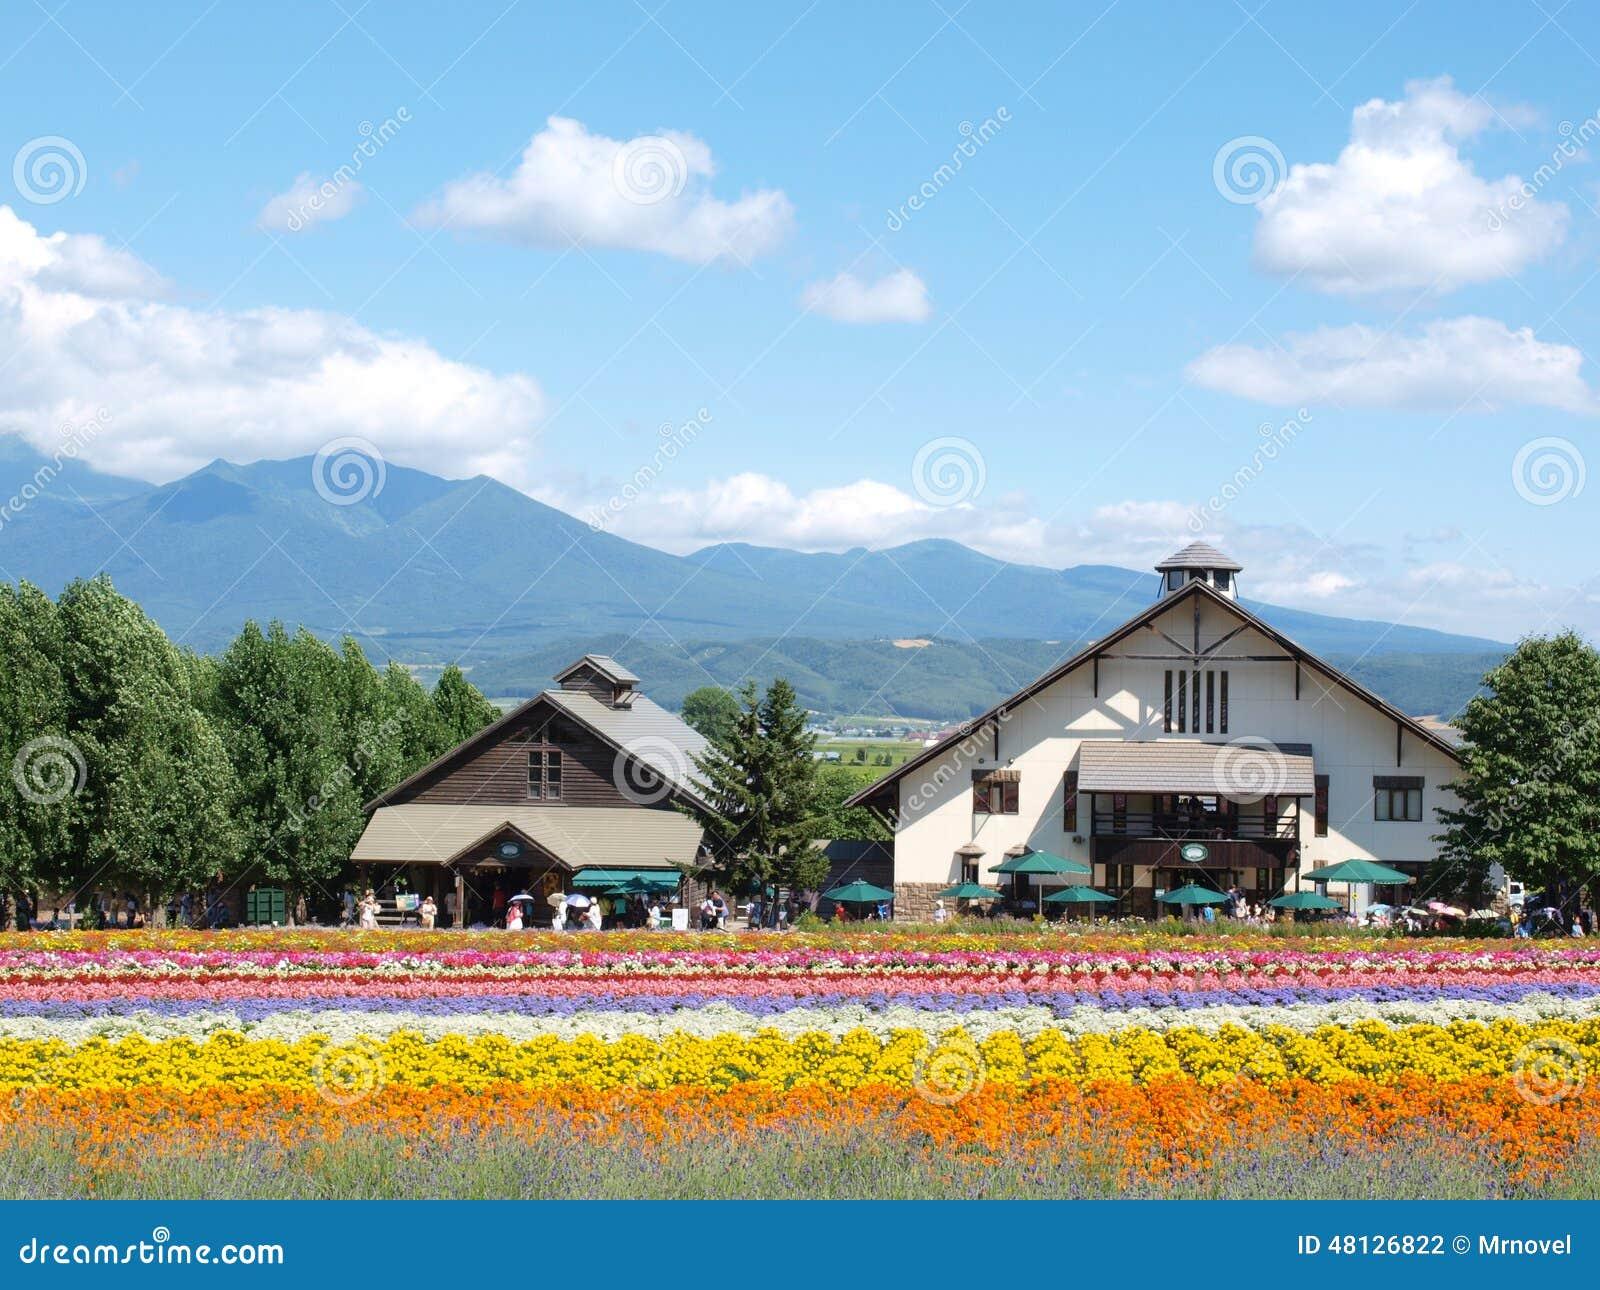 Small Houses At Tomita Farm In Furano Hokkaido Japan